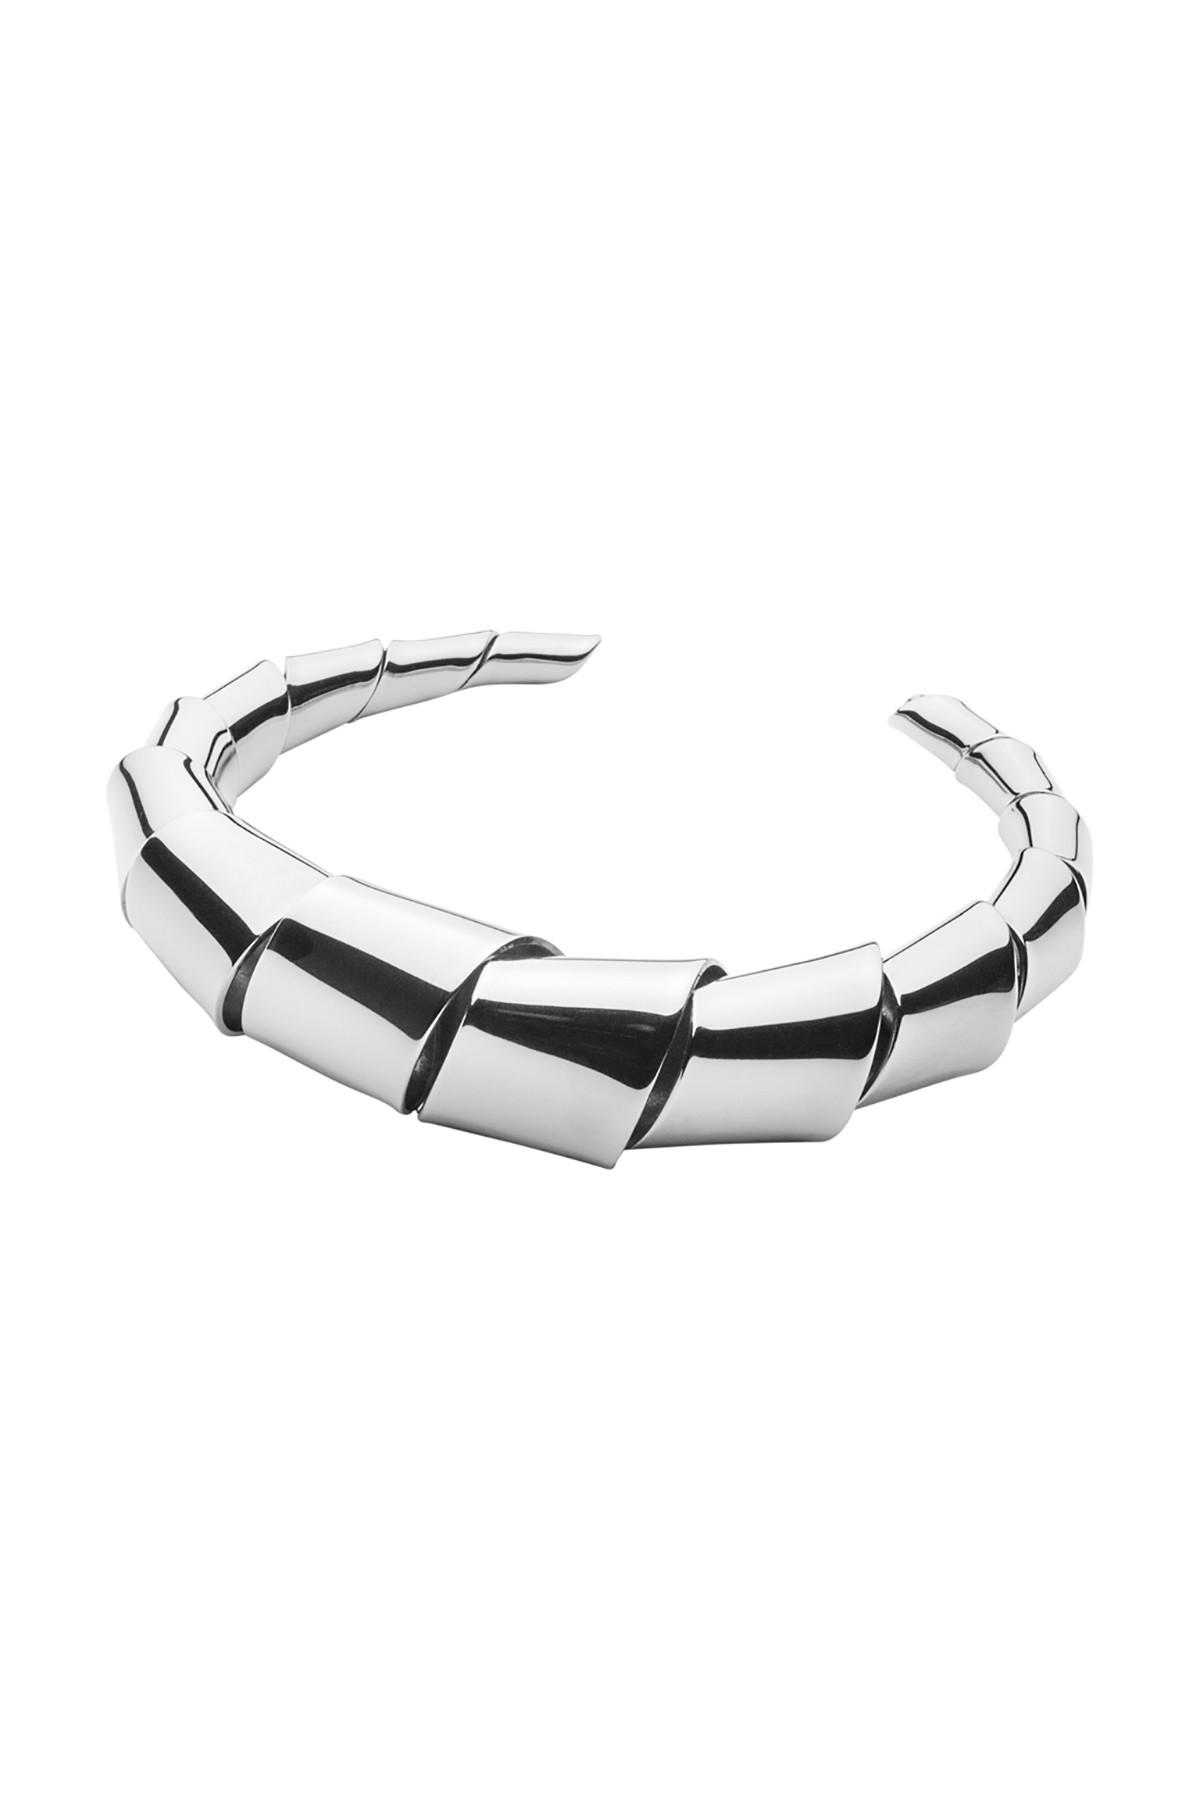 DYRBERG/KERN GIANNA BRACELET 350690 (Silver, ONESIZE)